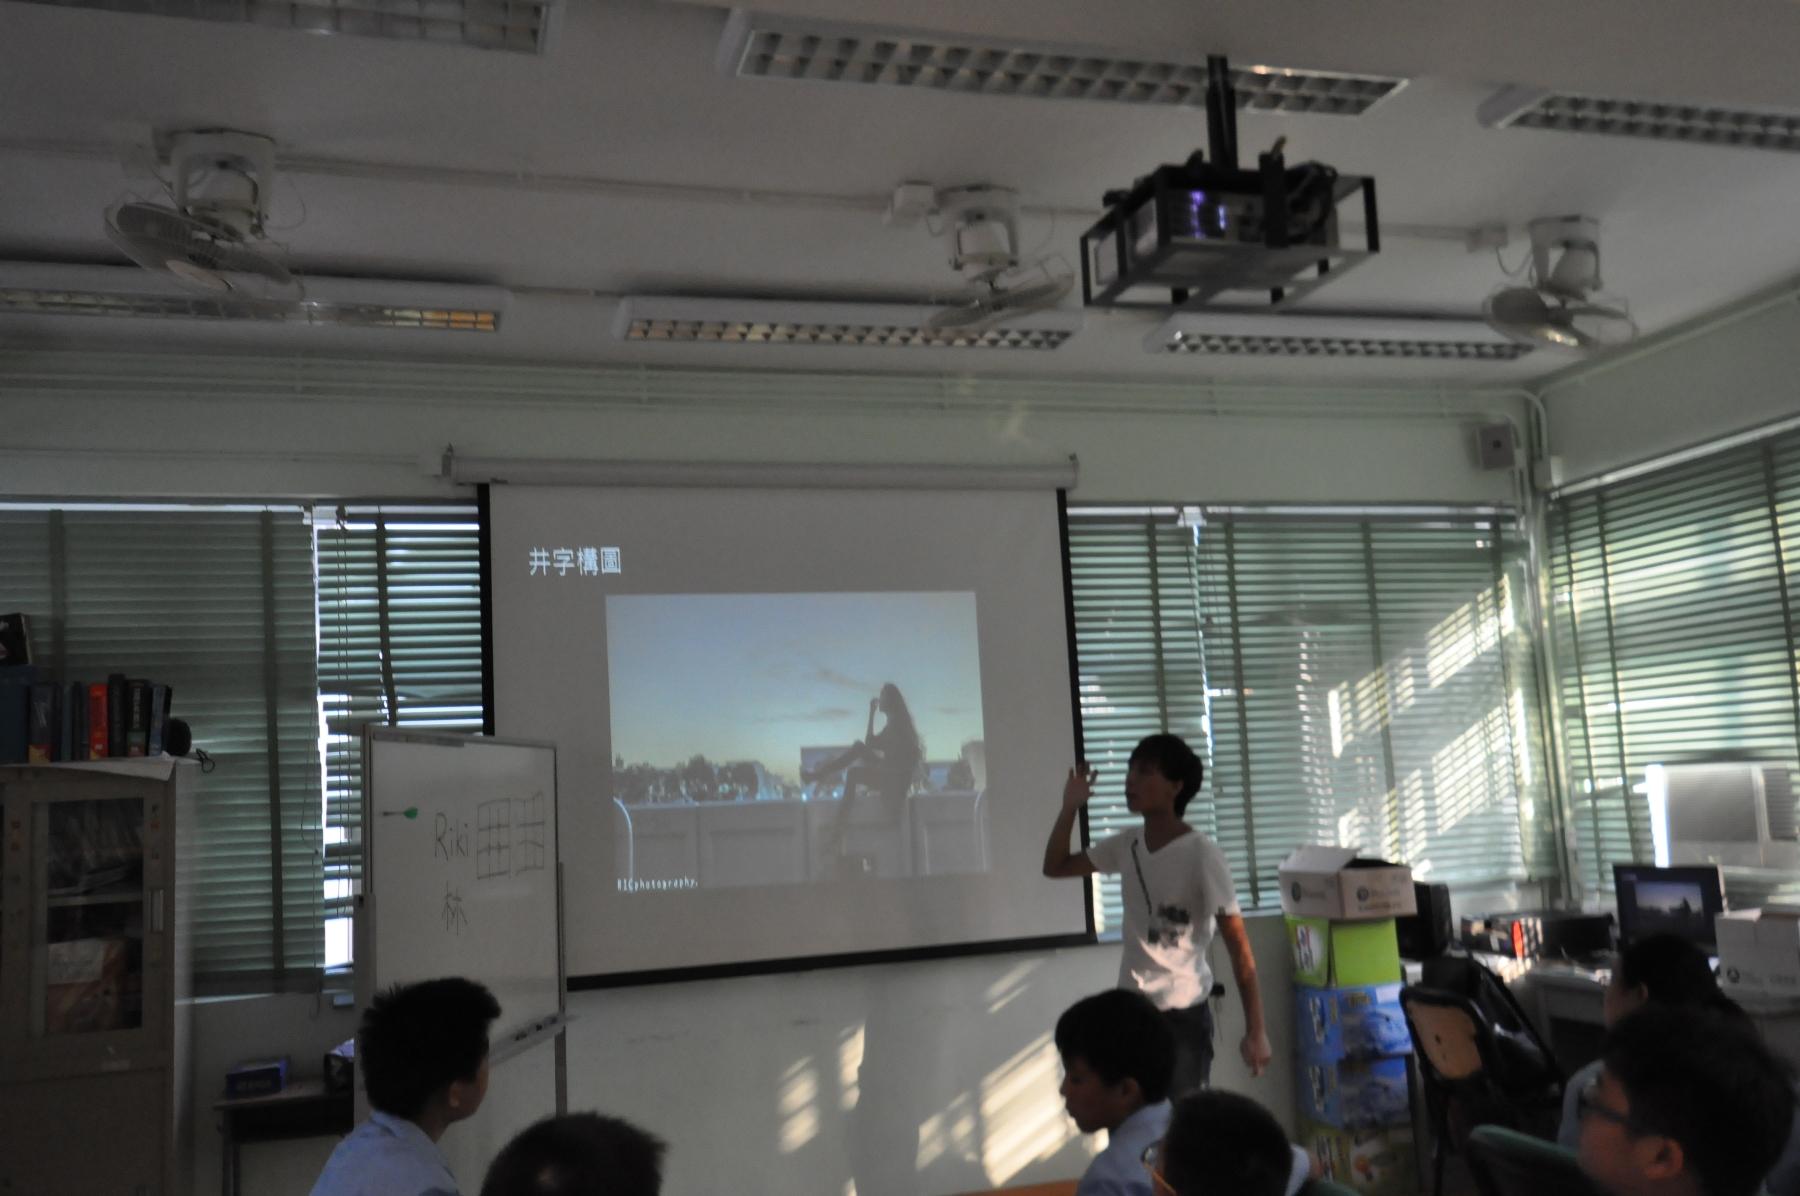 http://www.npc.edu.hk/sites/default/files/dsc_0005_3.jpg